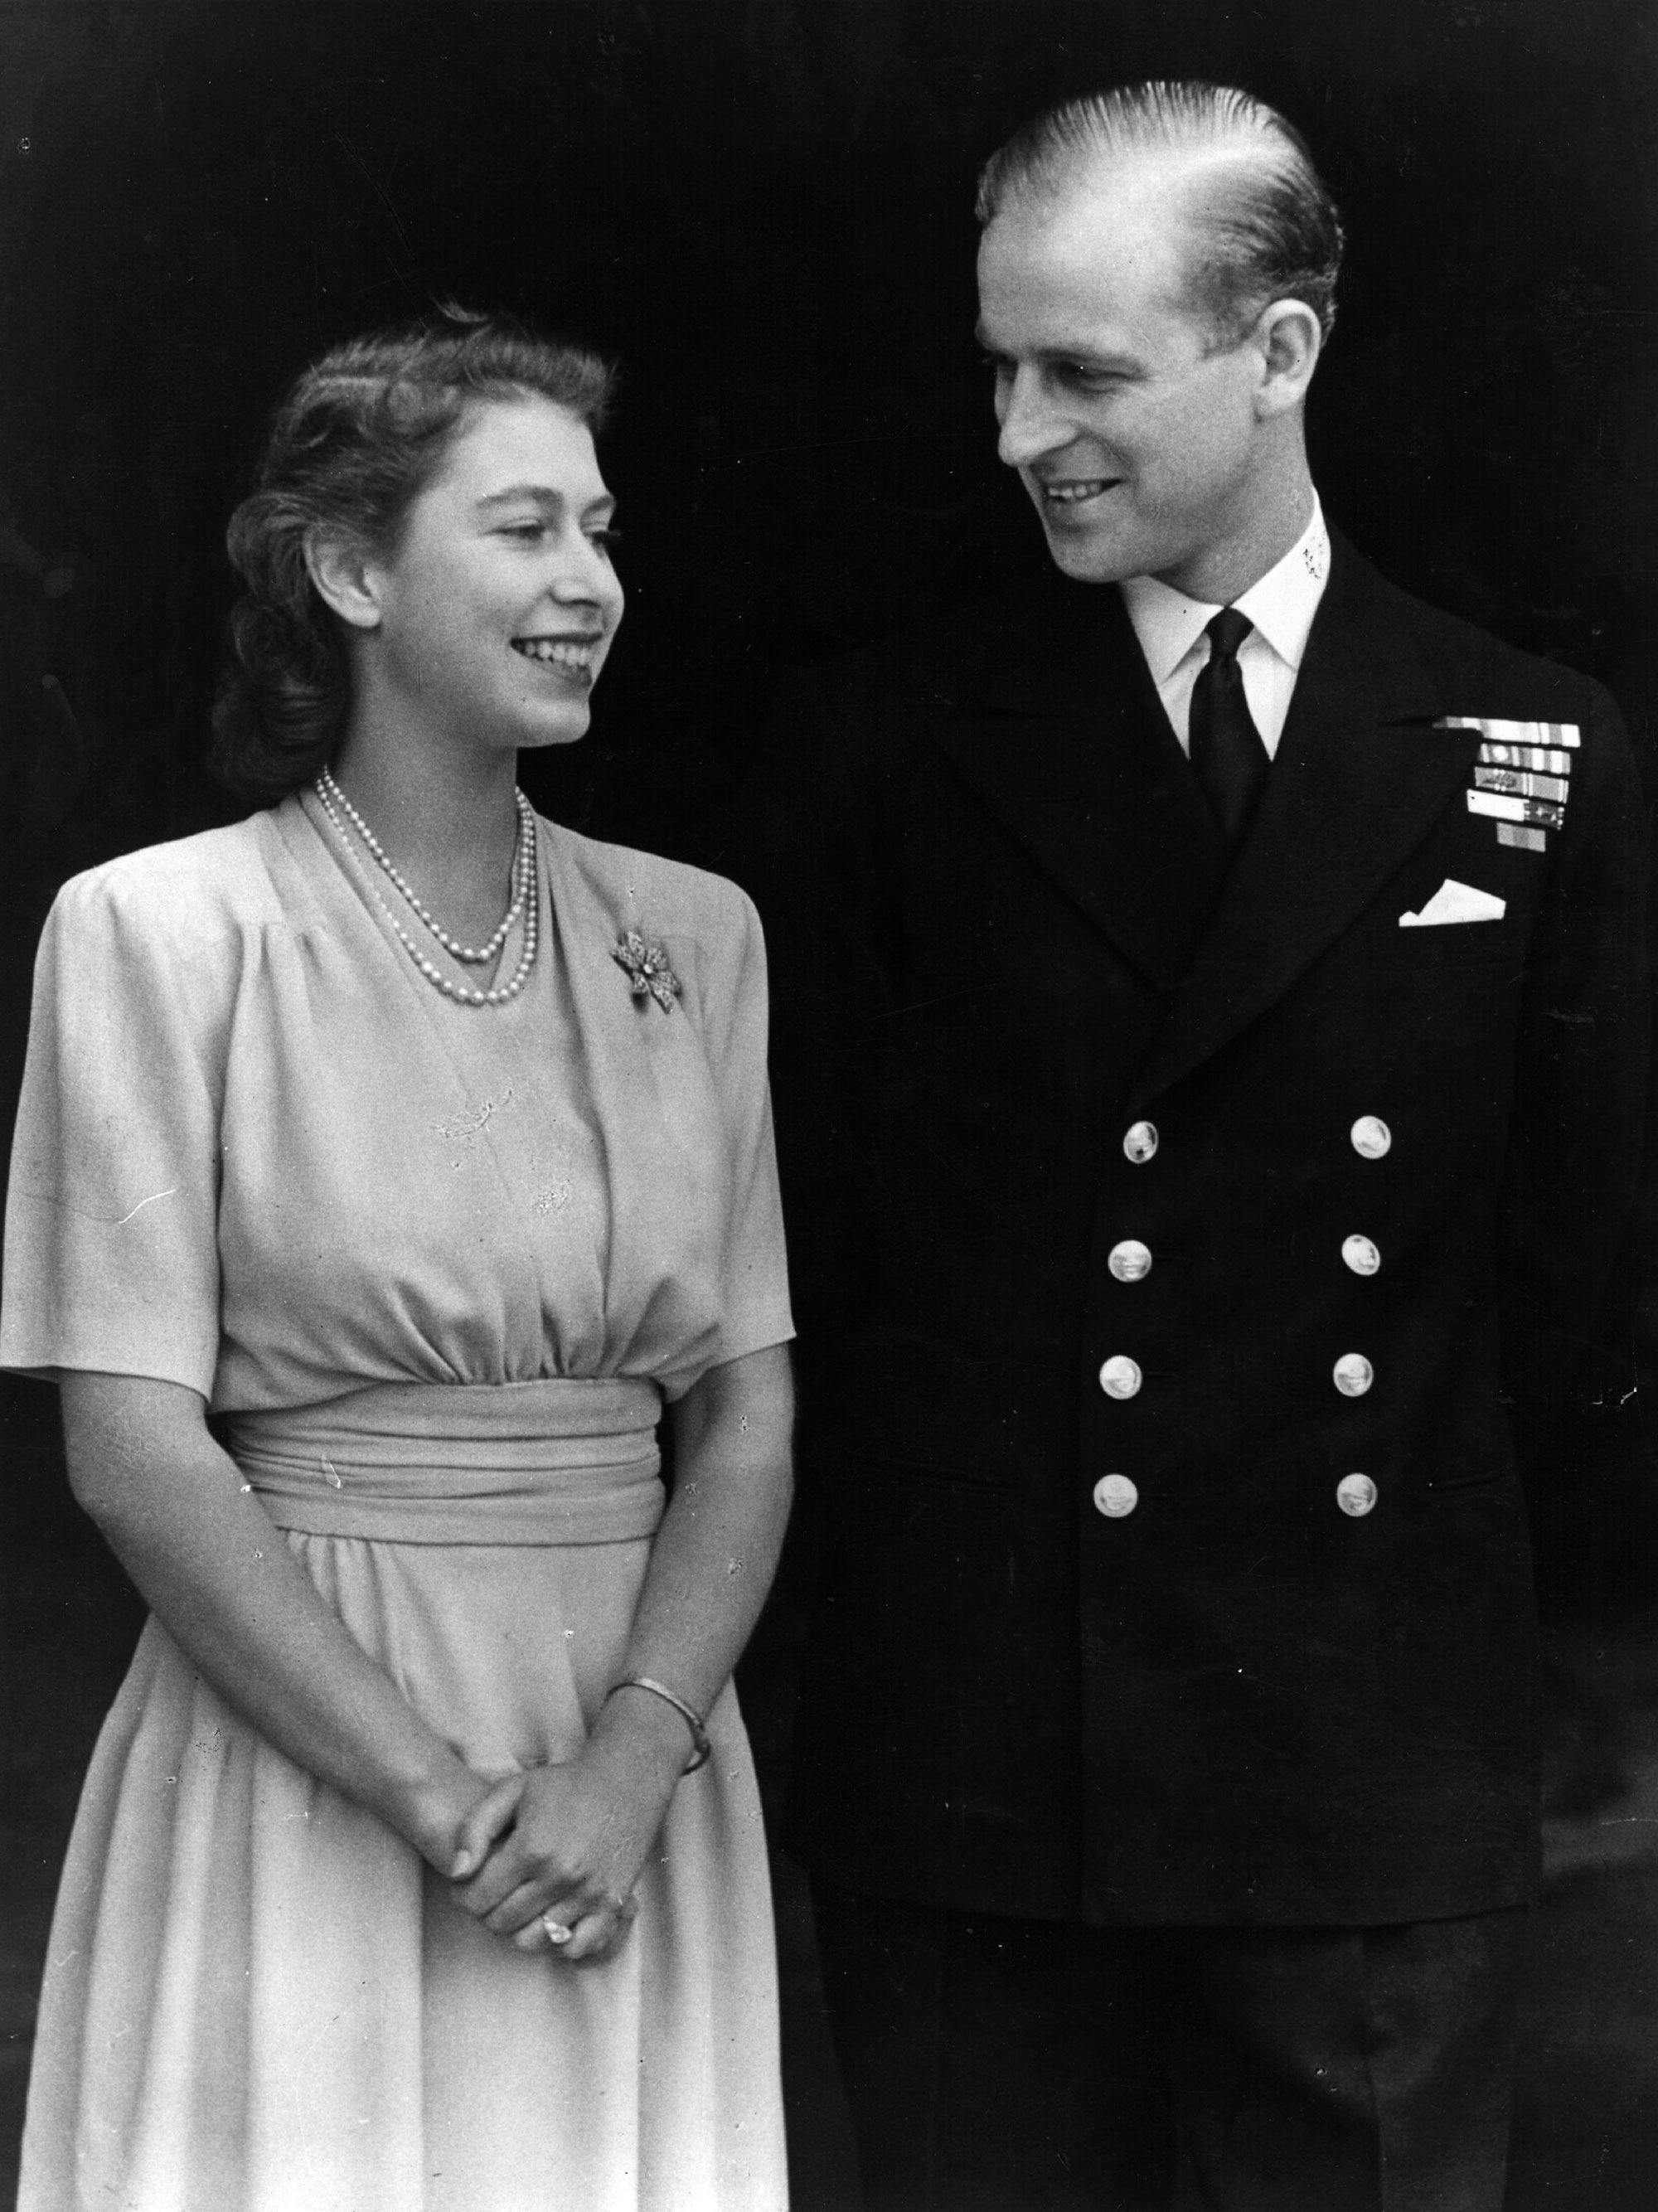 Queen Elizabeth Turns 92! See 15 Vintage Photographs of